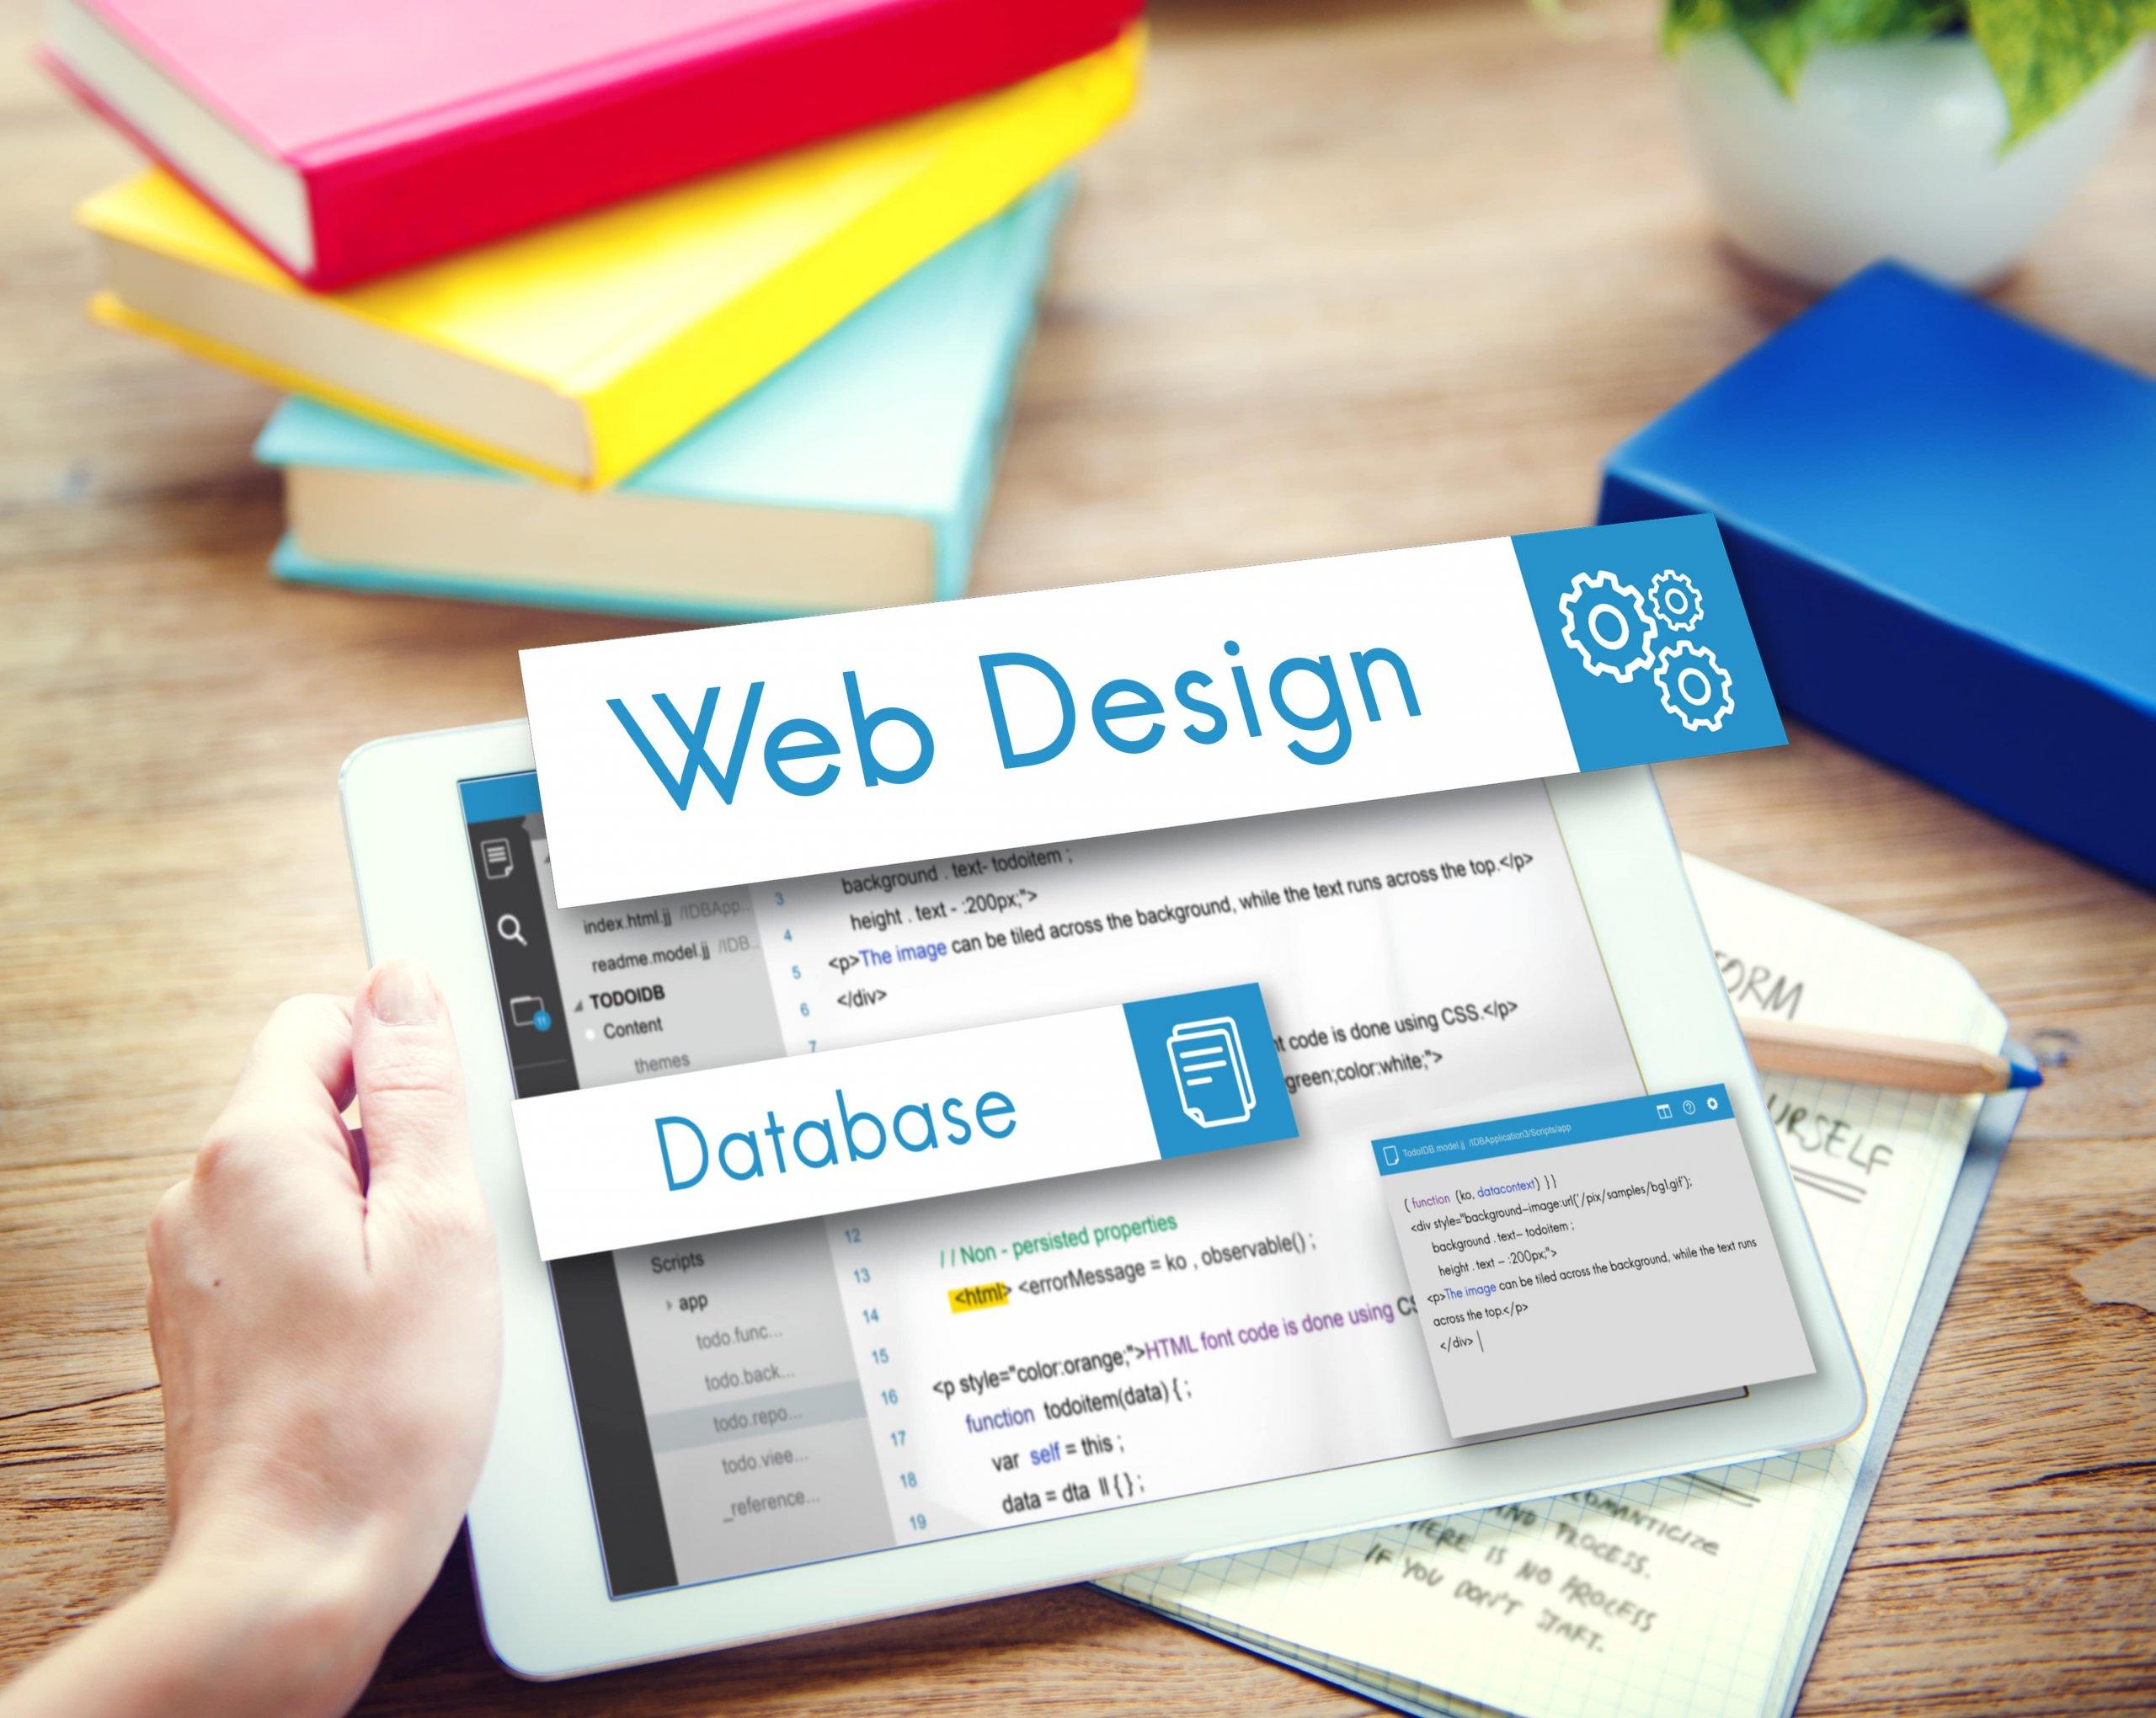 11 Essential Elements for a Good Website - Web Design